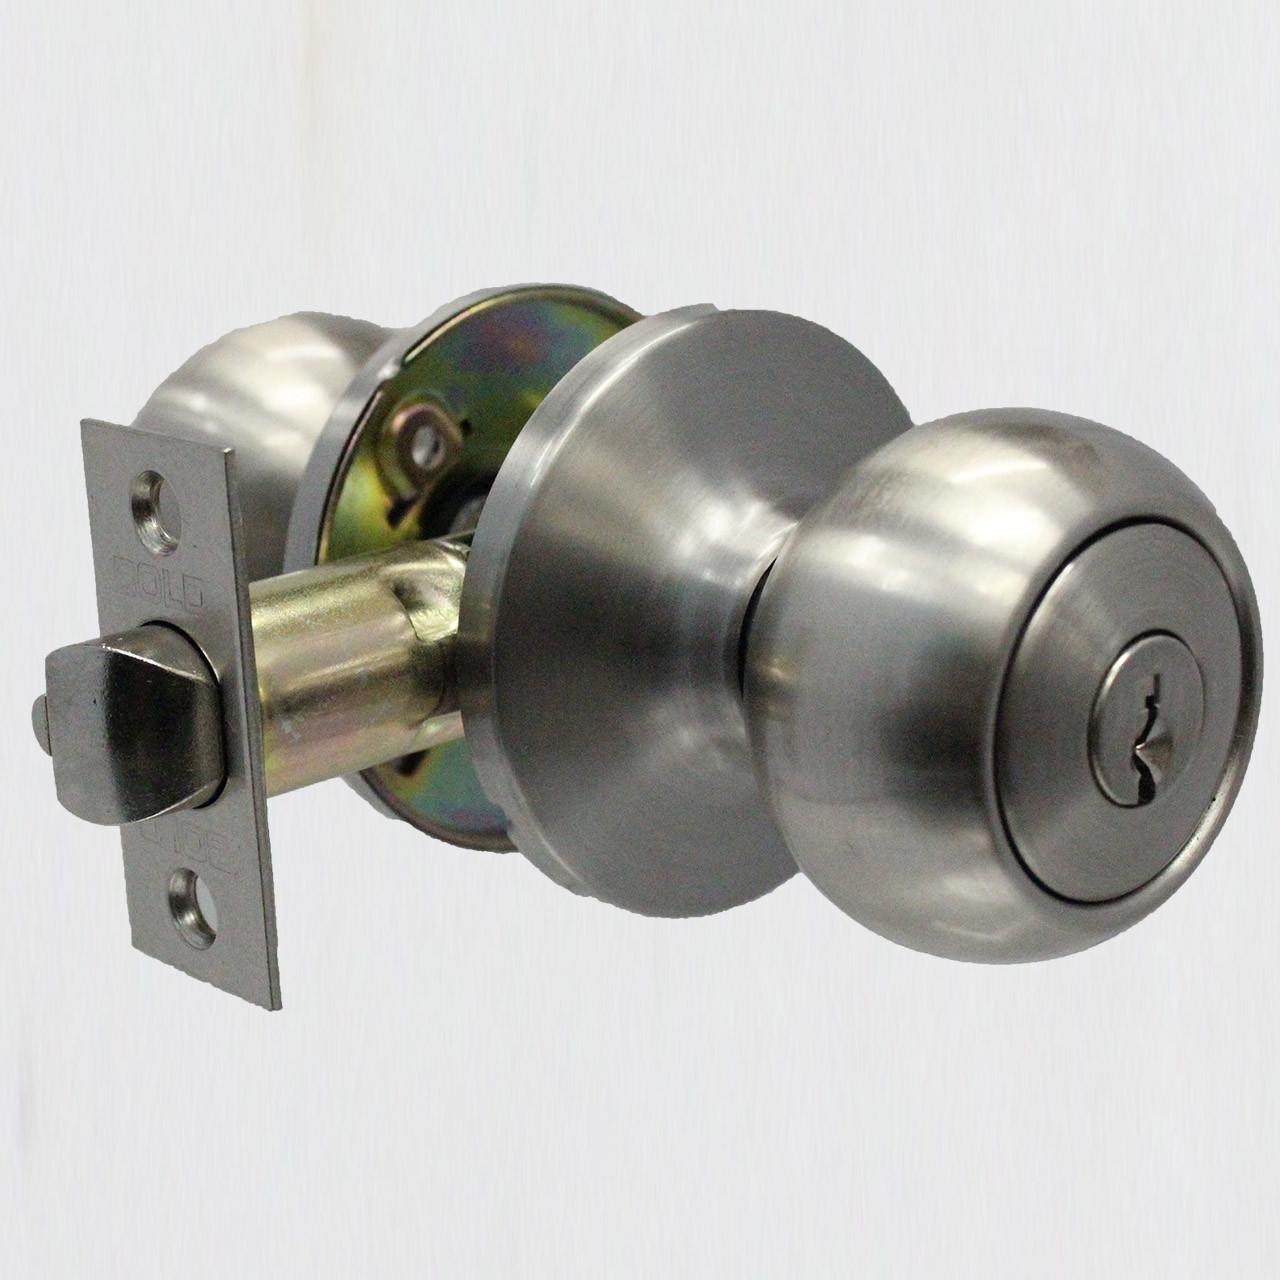 PREMIUM ENTRY DOOR KNOB K#8 (SILVER) - Bold Lock Supply